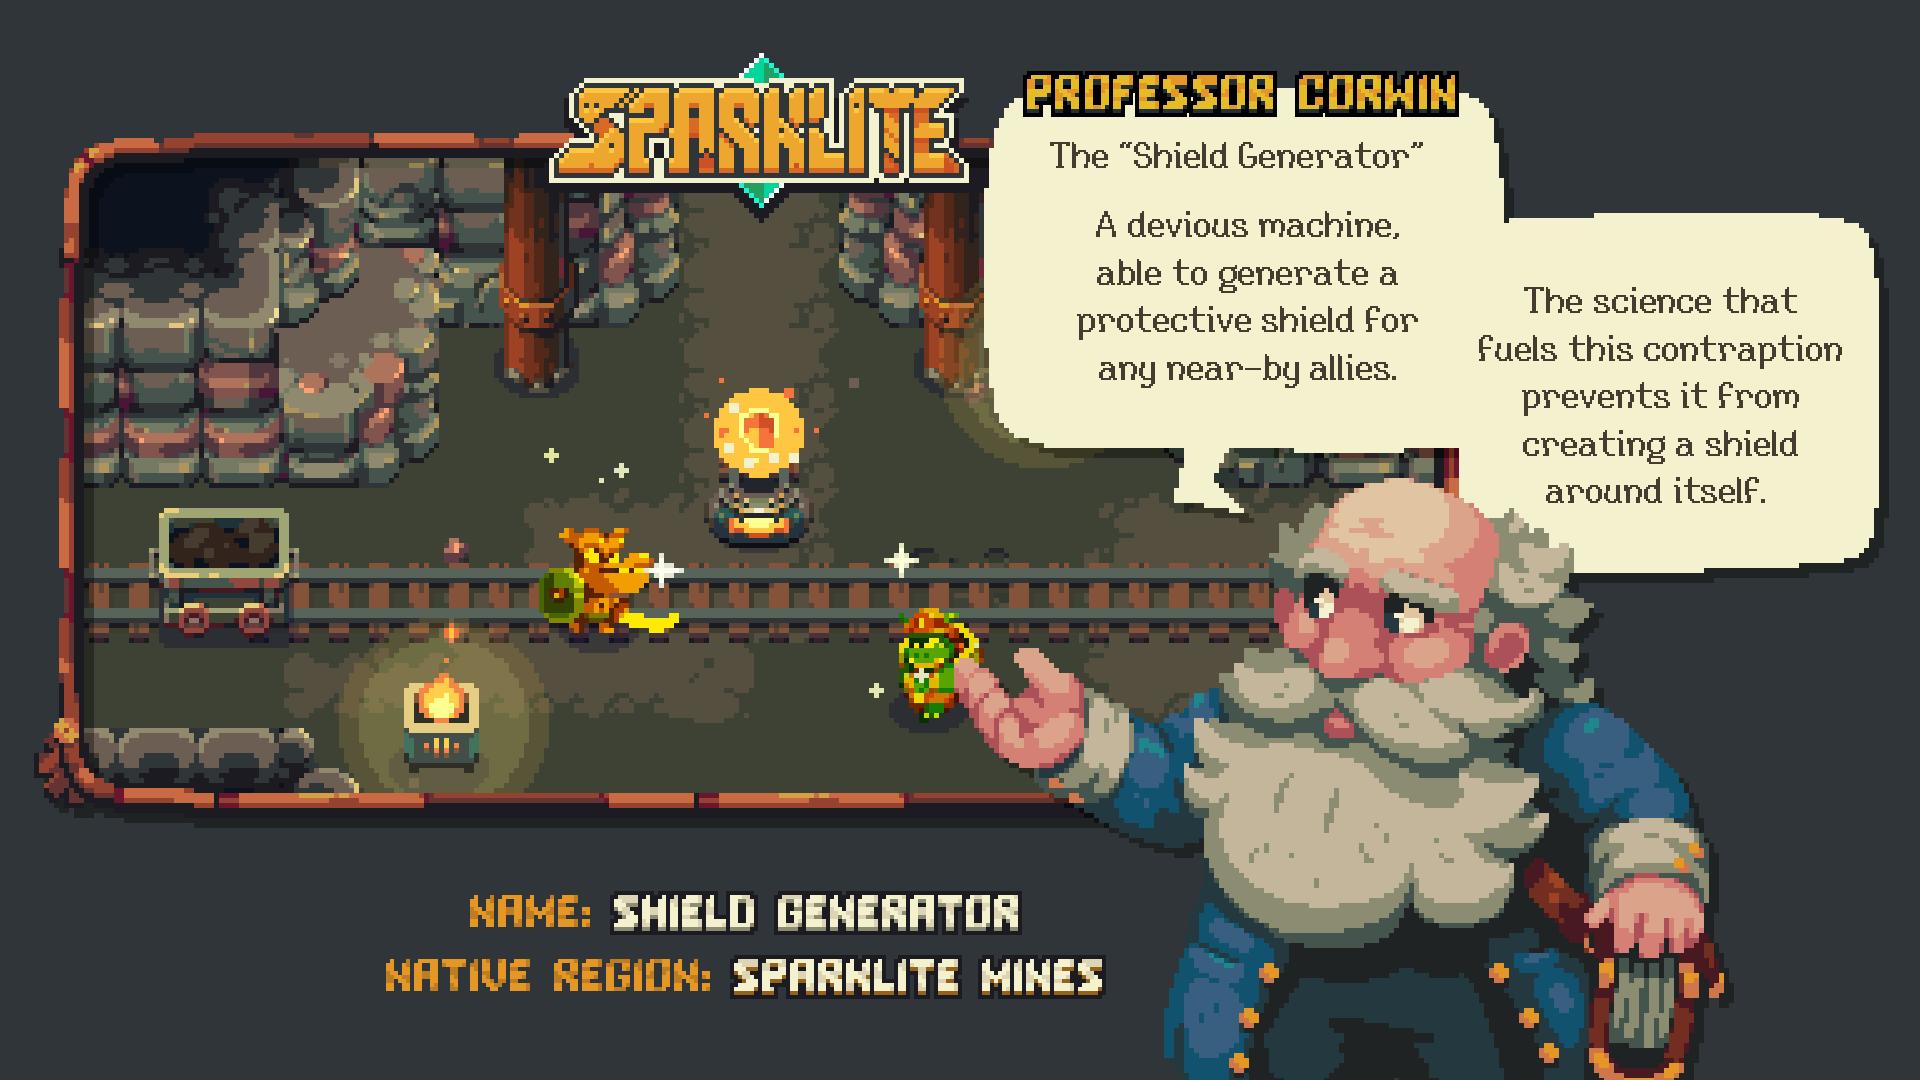 Sparklite Professor Corwin Shield Generator Screenshot